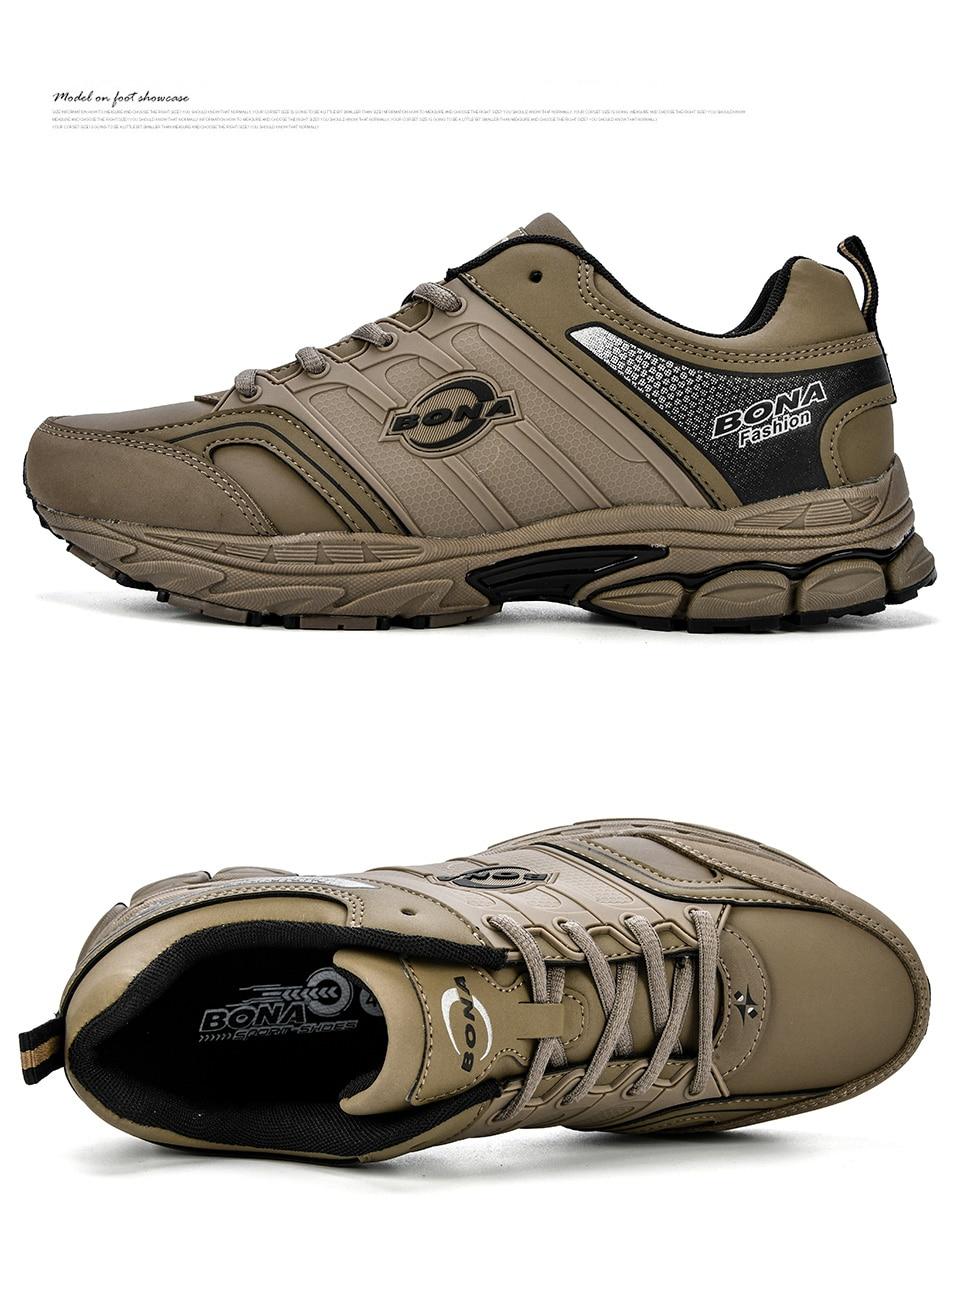 HTB16ur8Kh1YBuNjy1zcq6zNcXXaT BONA Men Casual Shoes Microfiber Man Flats Lace Up Breathable Men Fashion Classic Outdoor Shoes Zapatos De Hombre Free Shipping